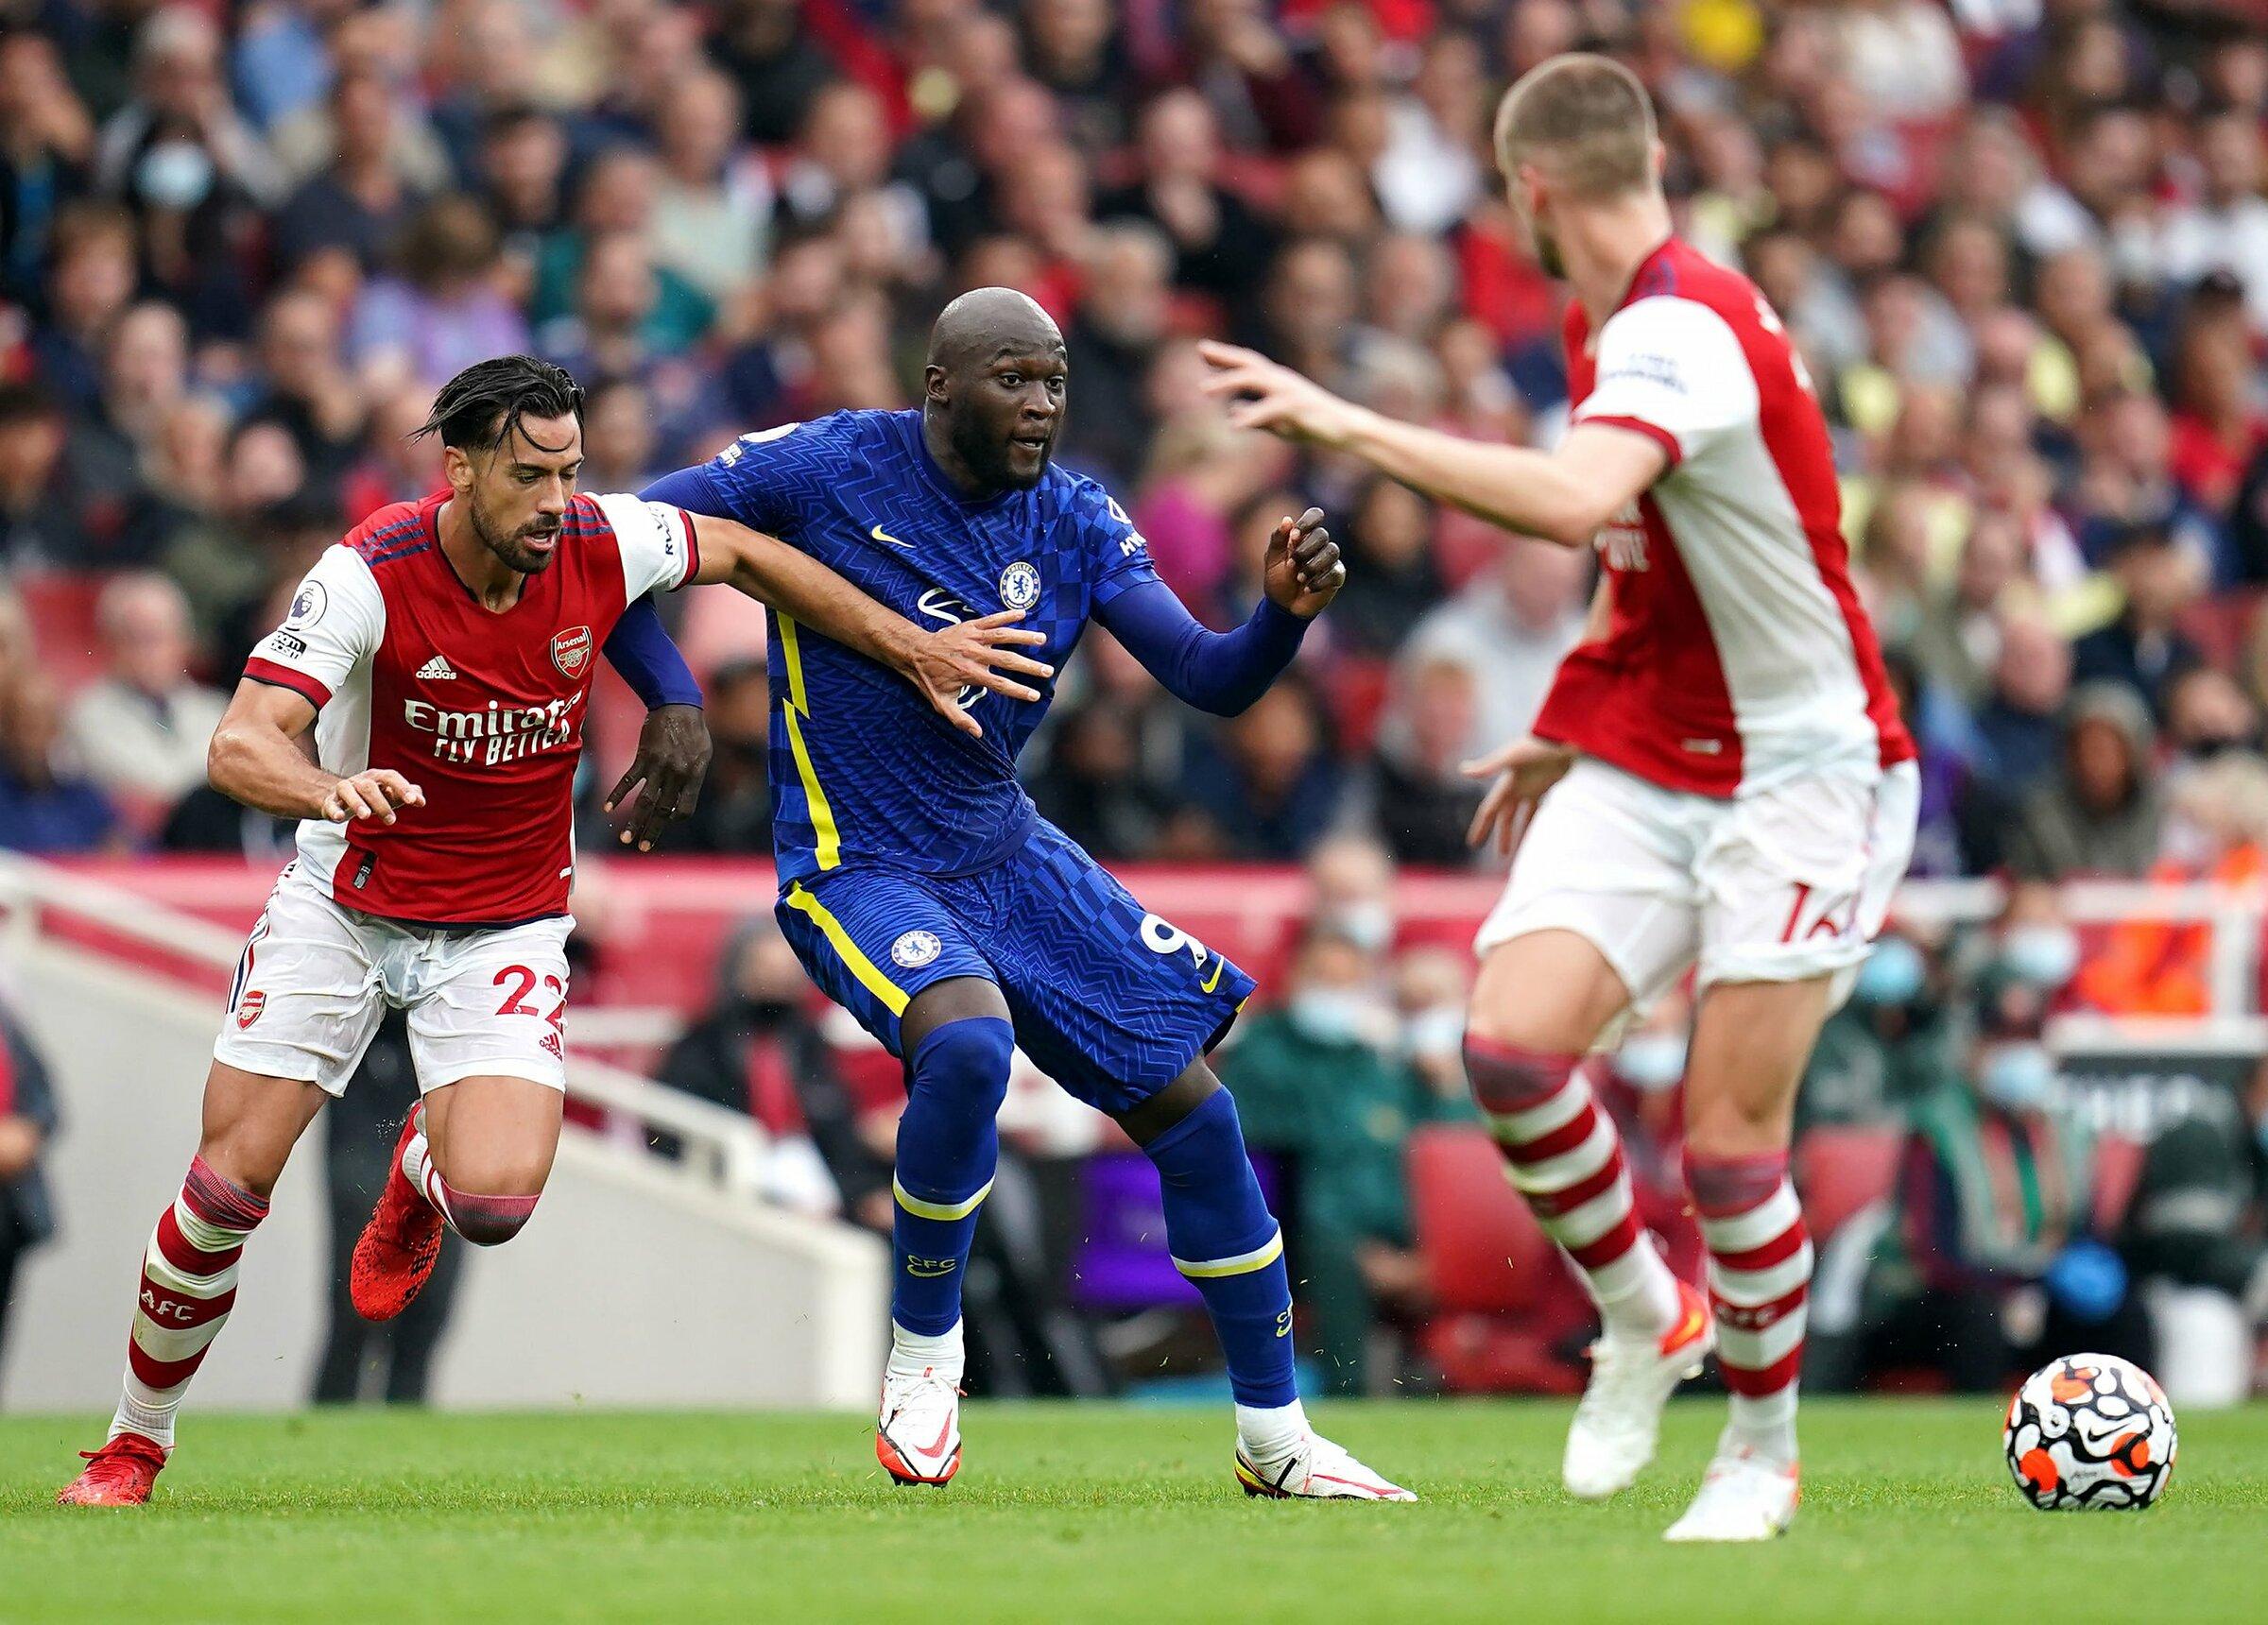 "Pablo Mari (ซ้าย) มีเกมที่ยากที่สุดของเขาตั้งแต่มาถึง Arsenal เมื่อเขาเผชิญหน้ากับ Lukaku ที่เหมือนวัวกระทิงในลอนดอนดาร์บี้เมื่อวันที่ 22 สิงหาคม  ภาพถ่าย: ""PA ."""